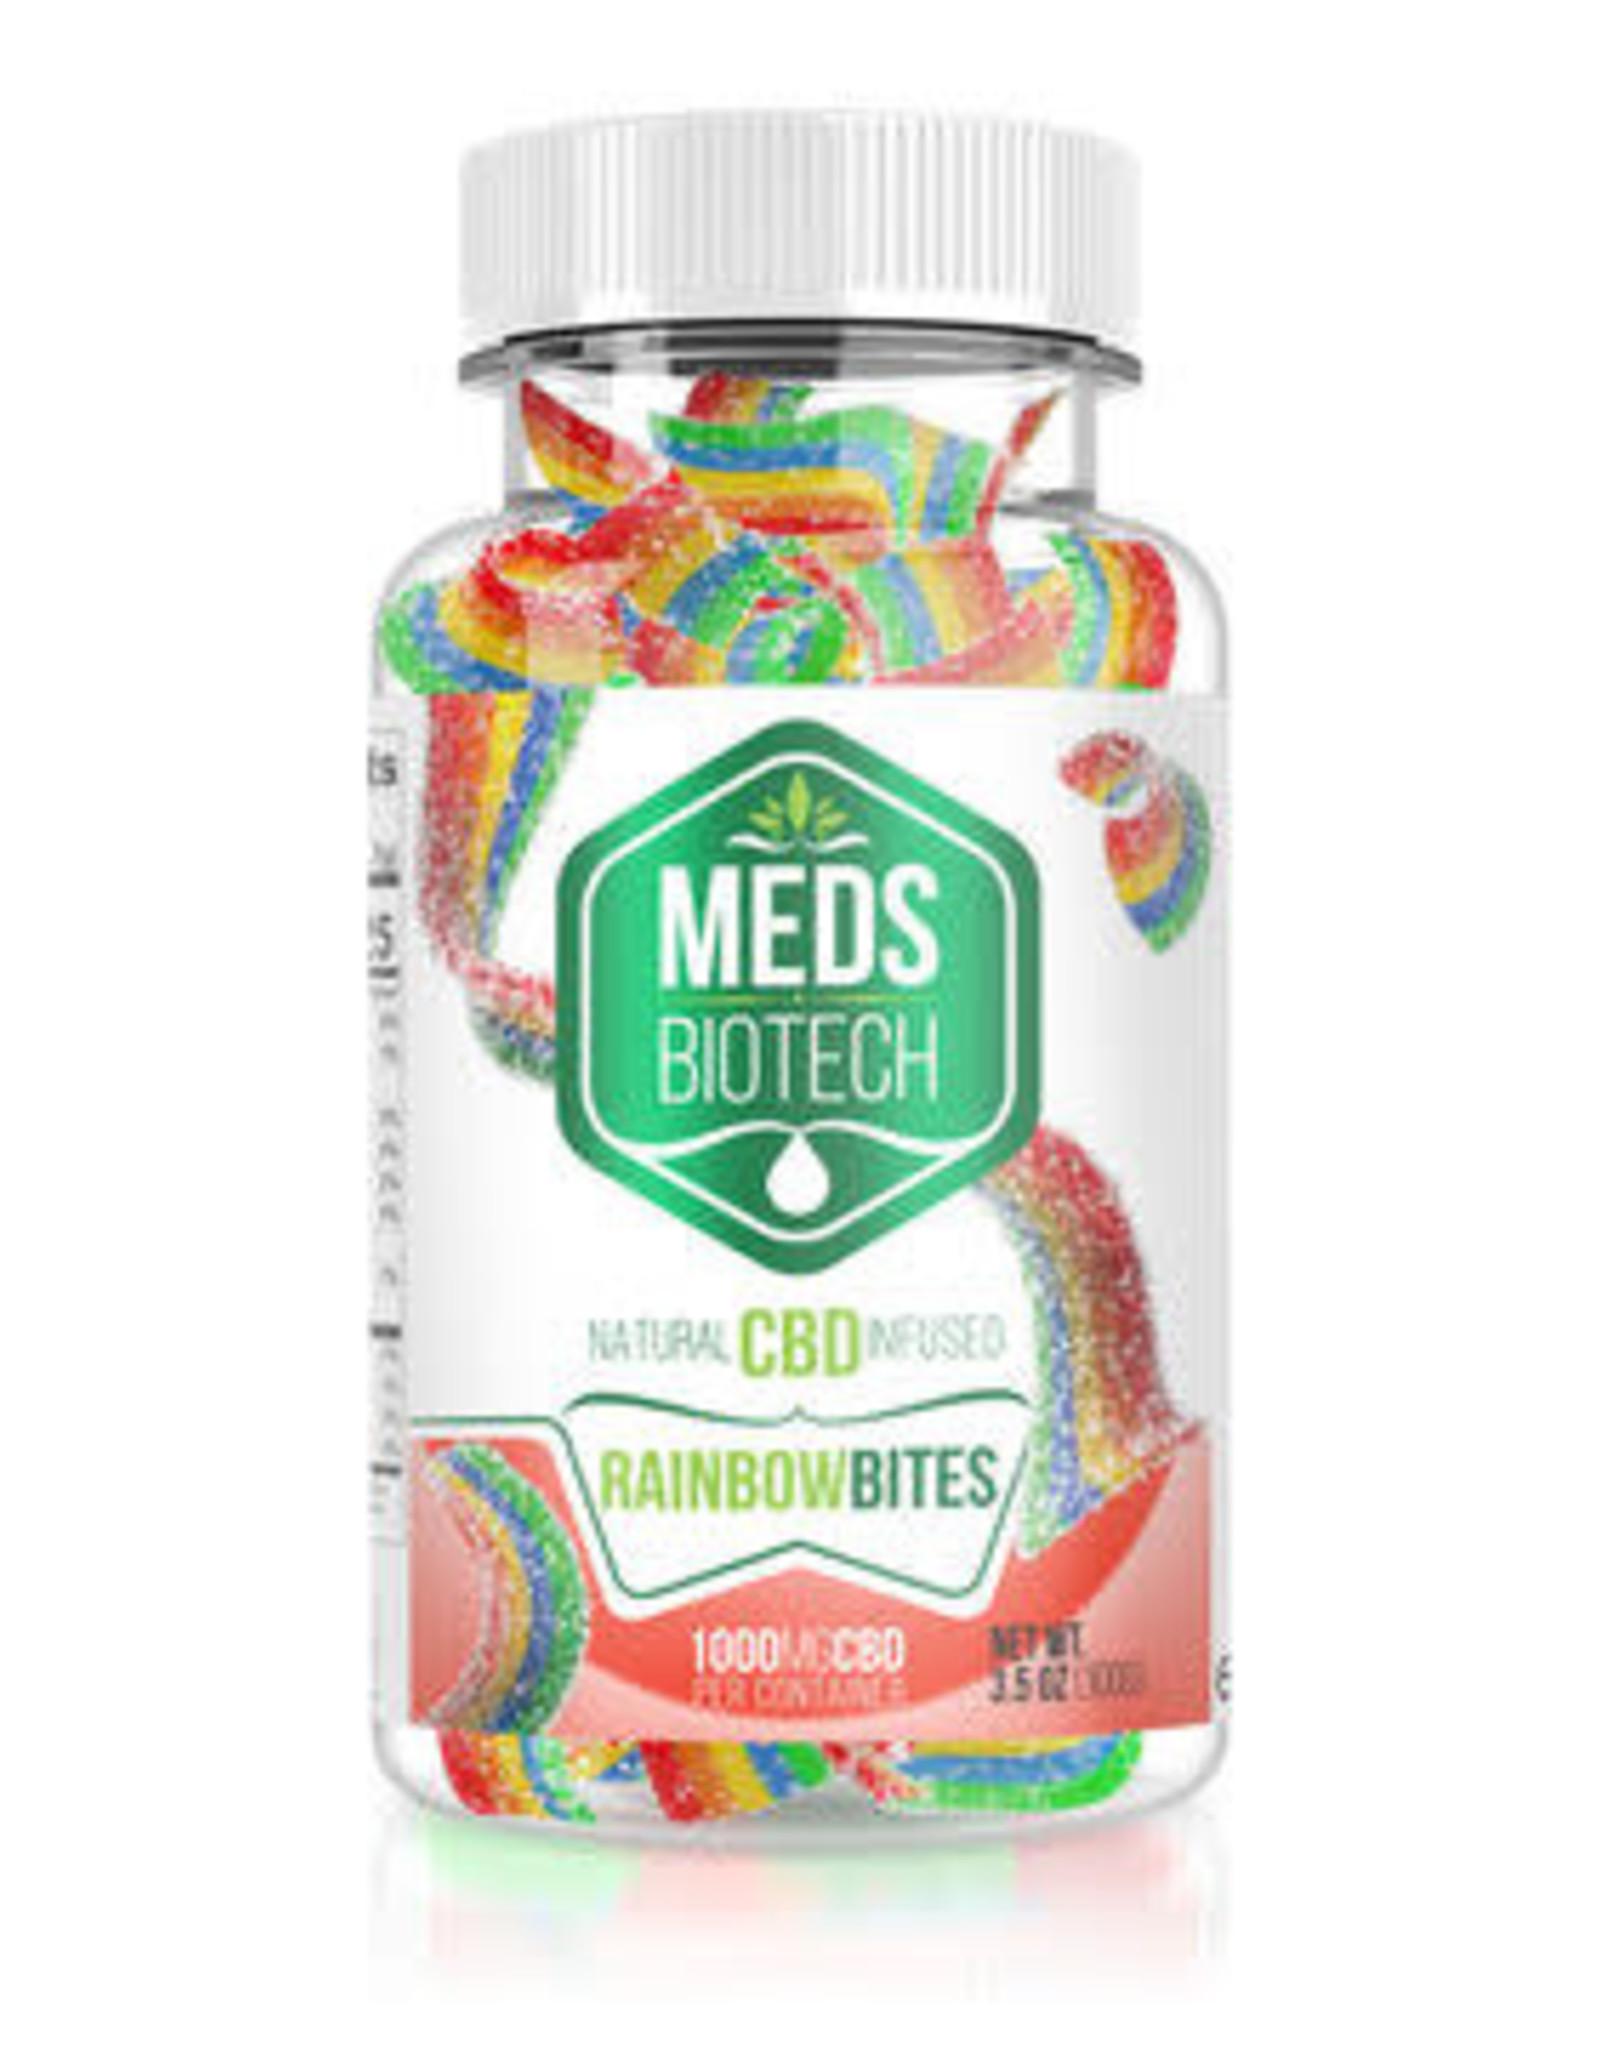 Diamond Meds Biotech Rainbow Gummie Bites 500mg